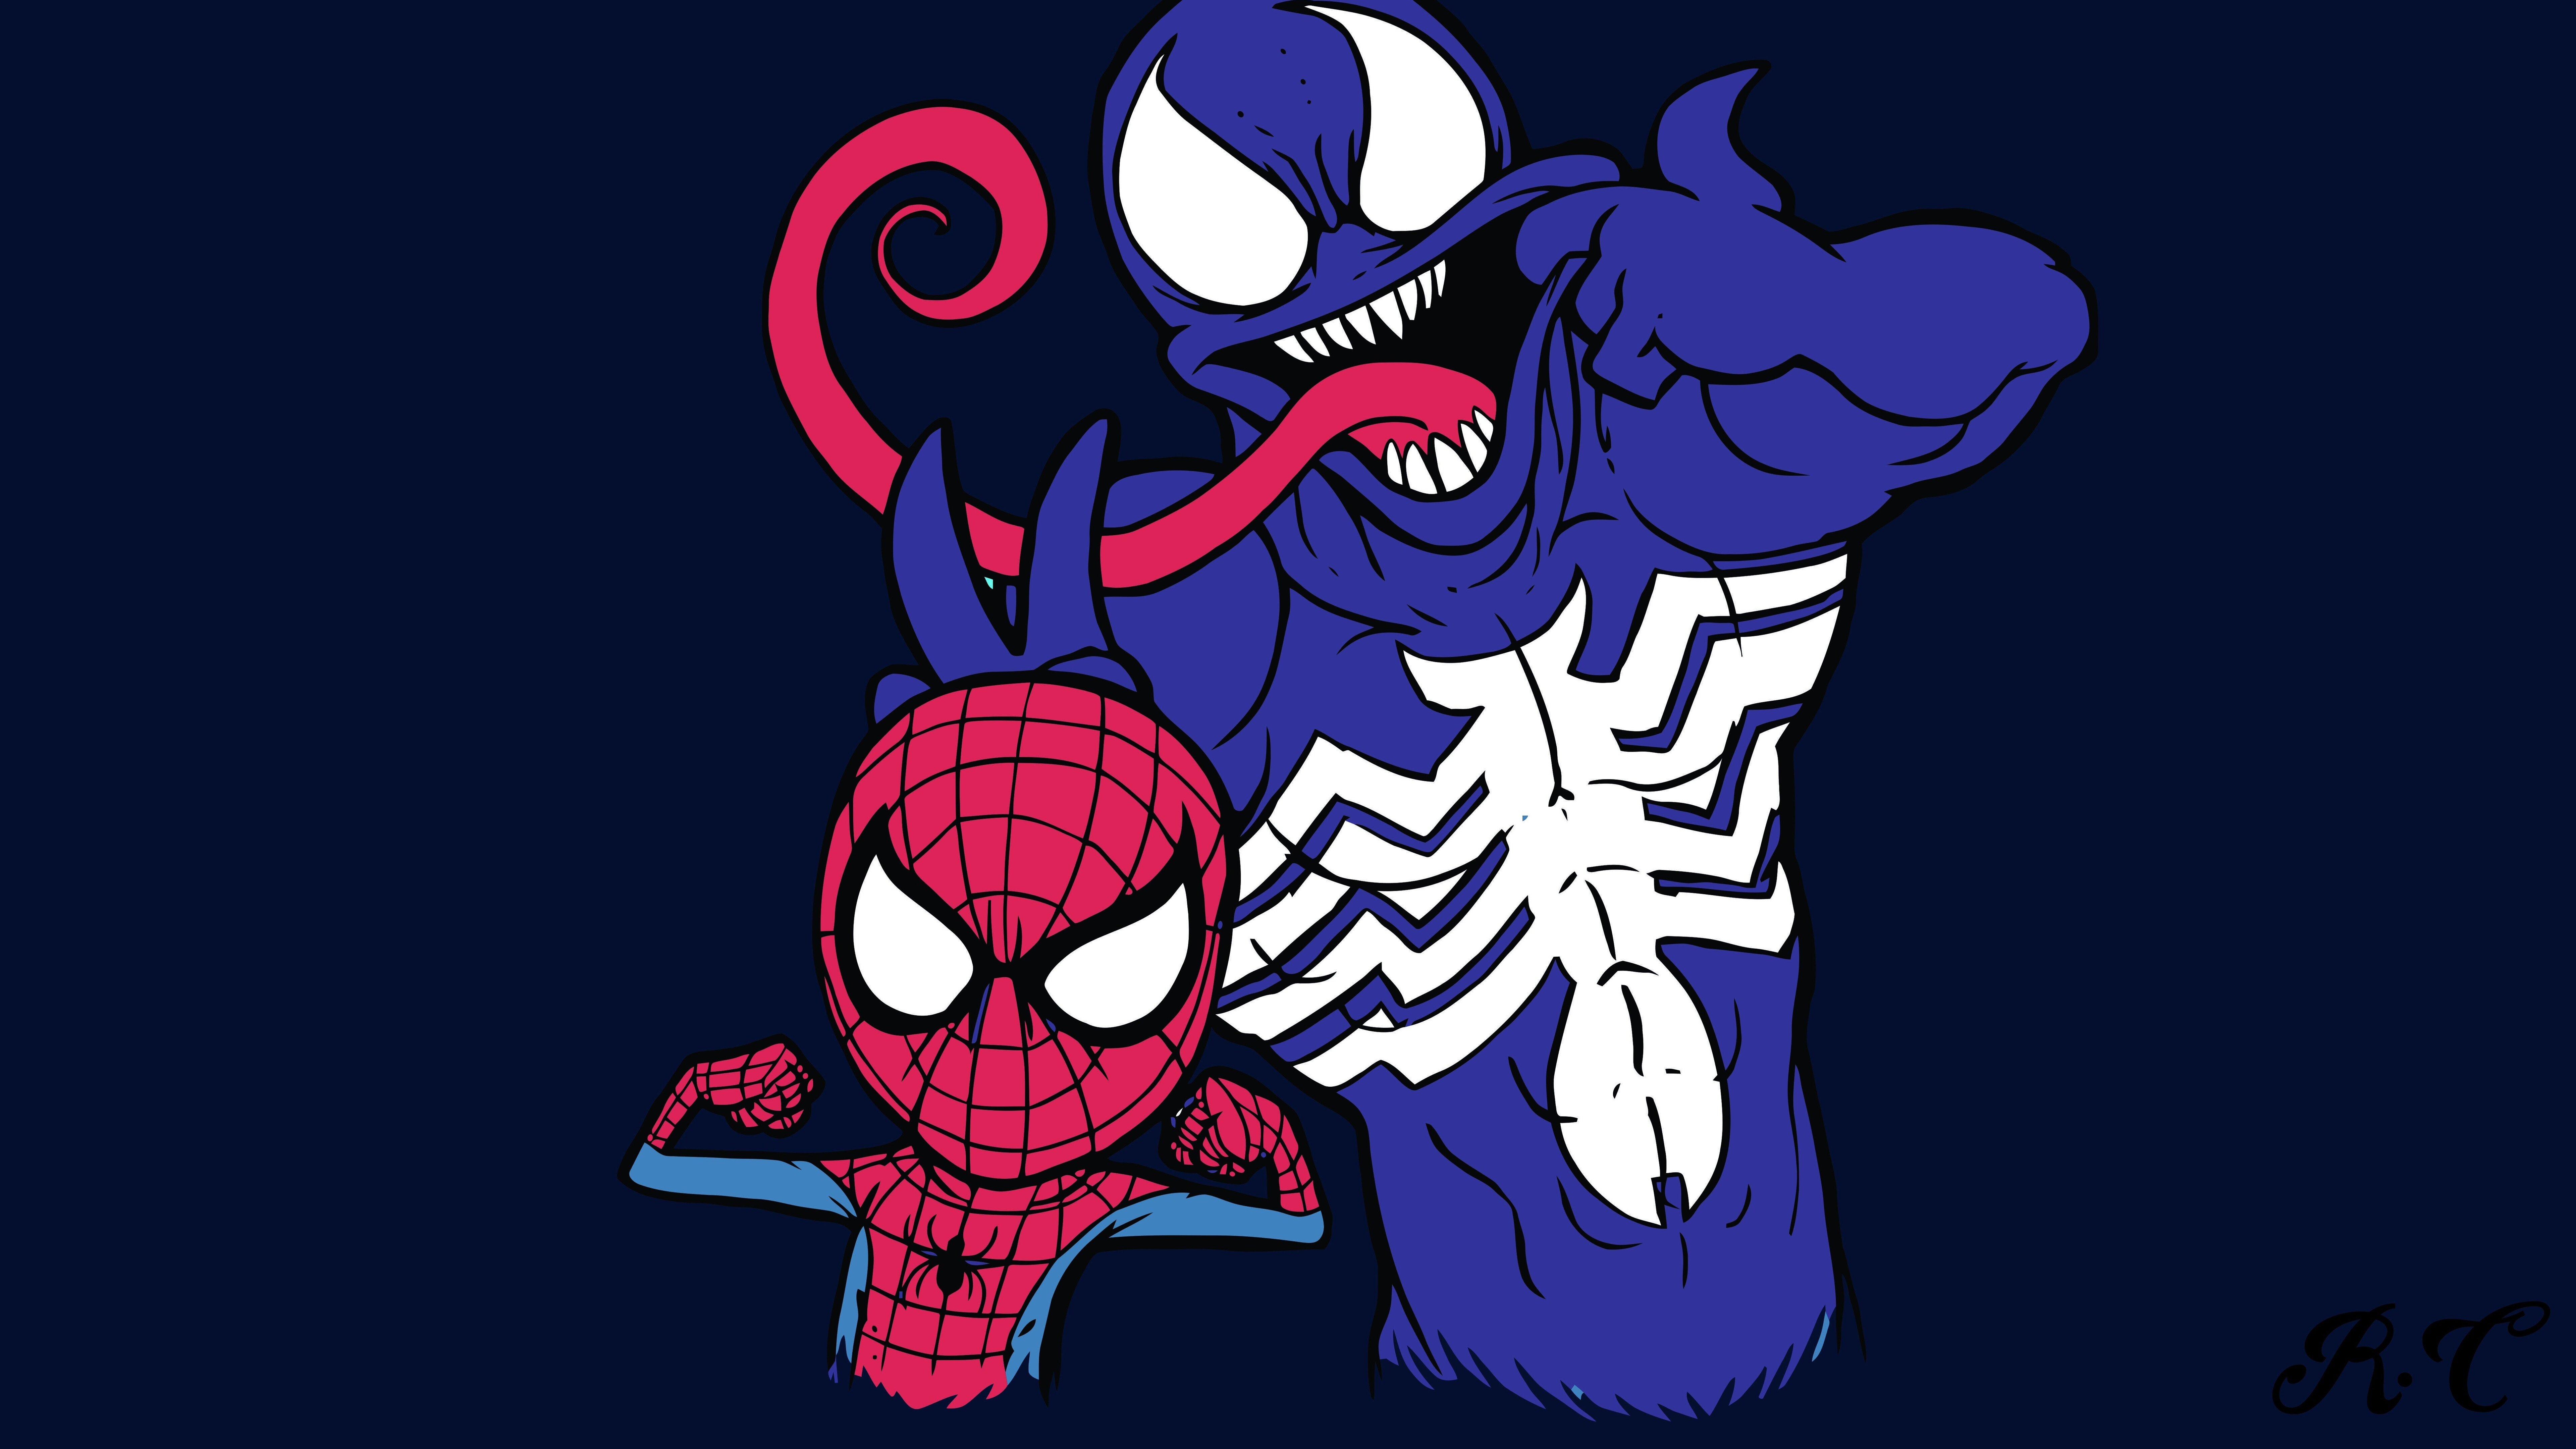 7680x4320 Venom And Spiderman 8k 8k HD 4k Wallpapers ...